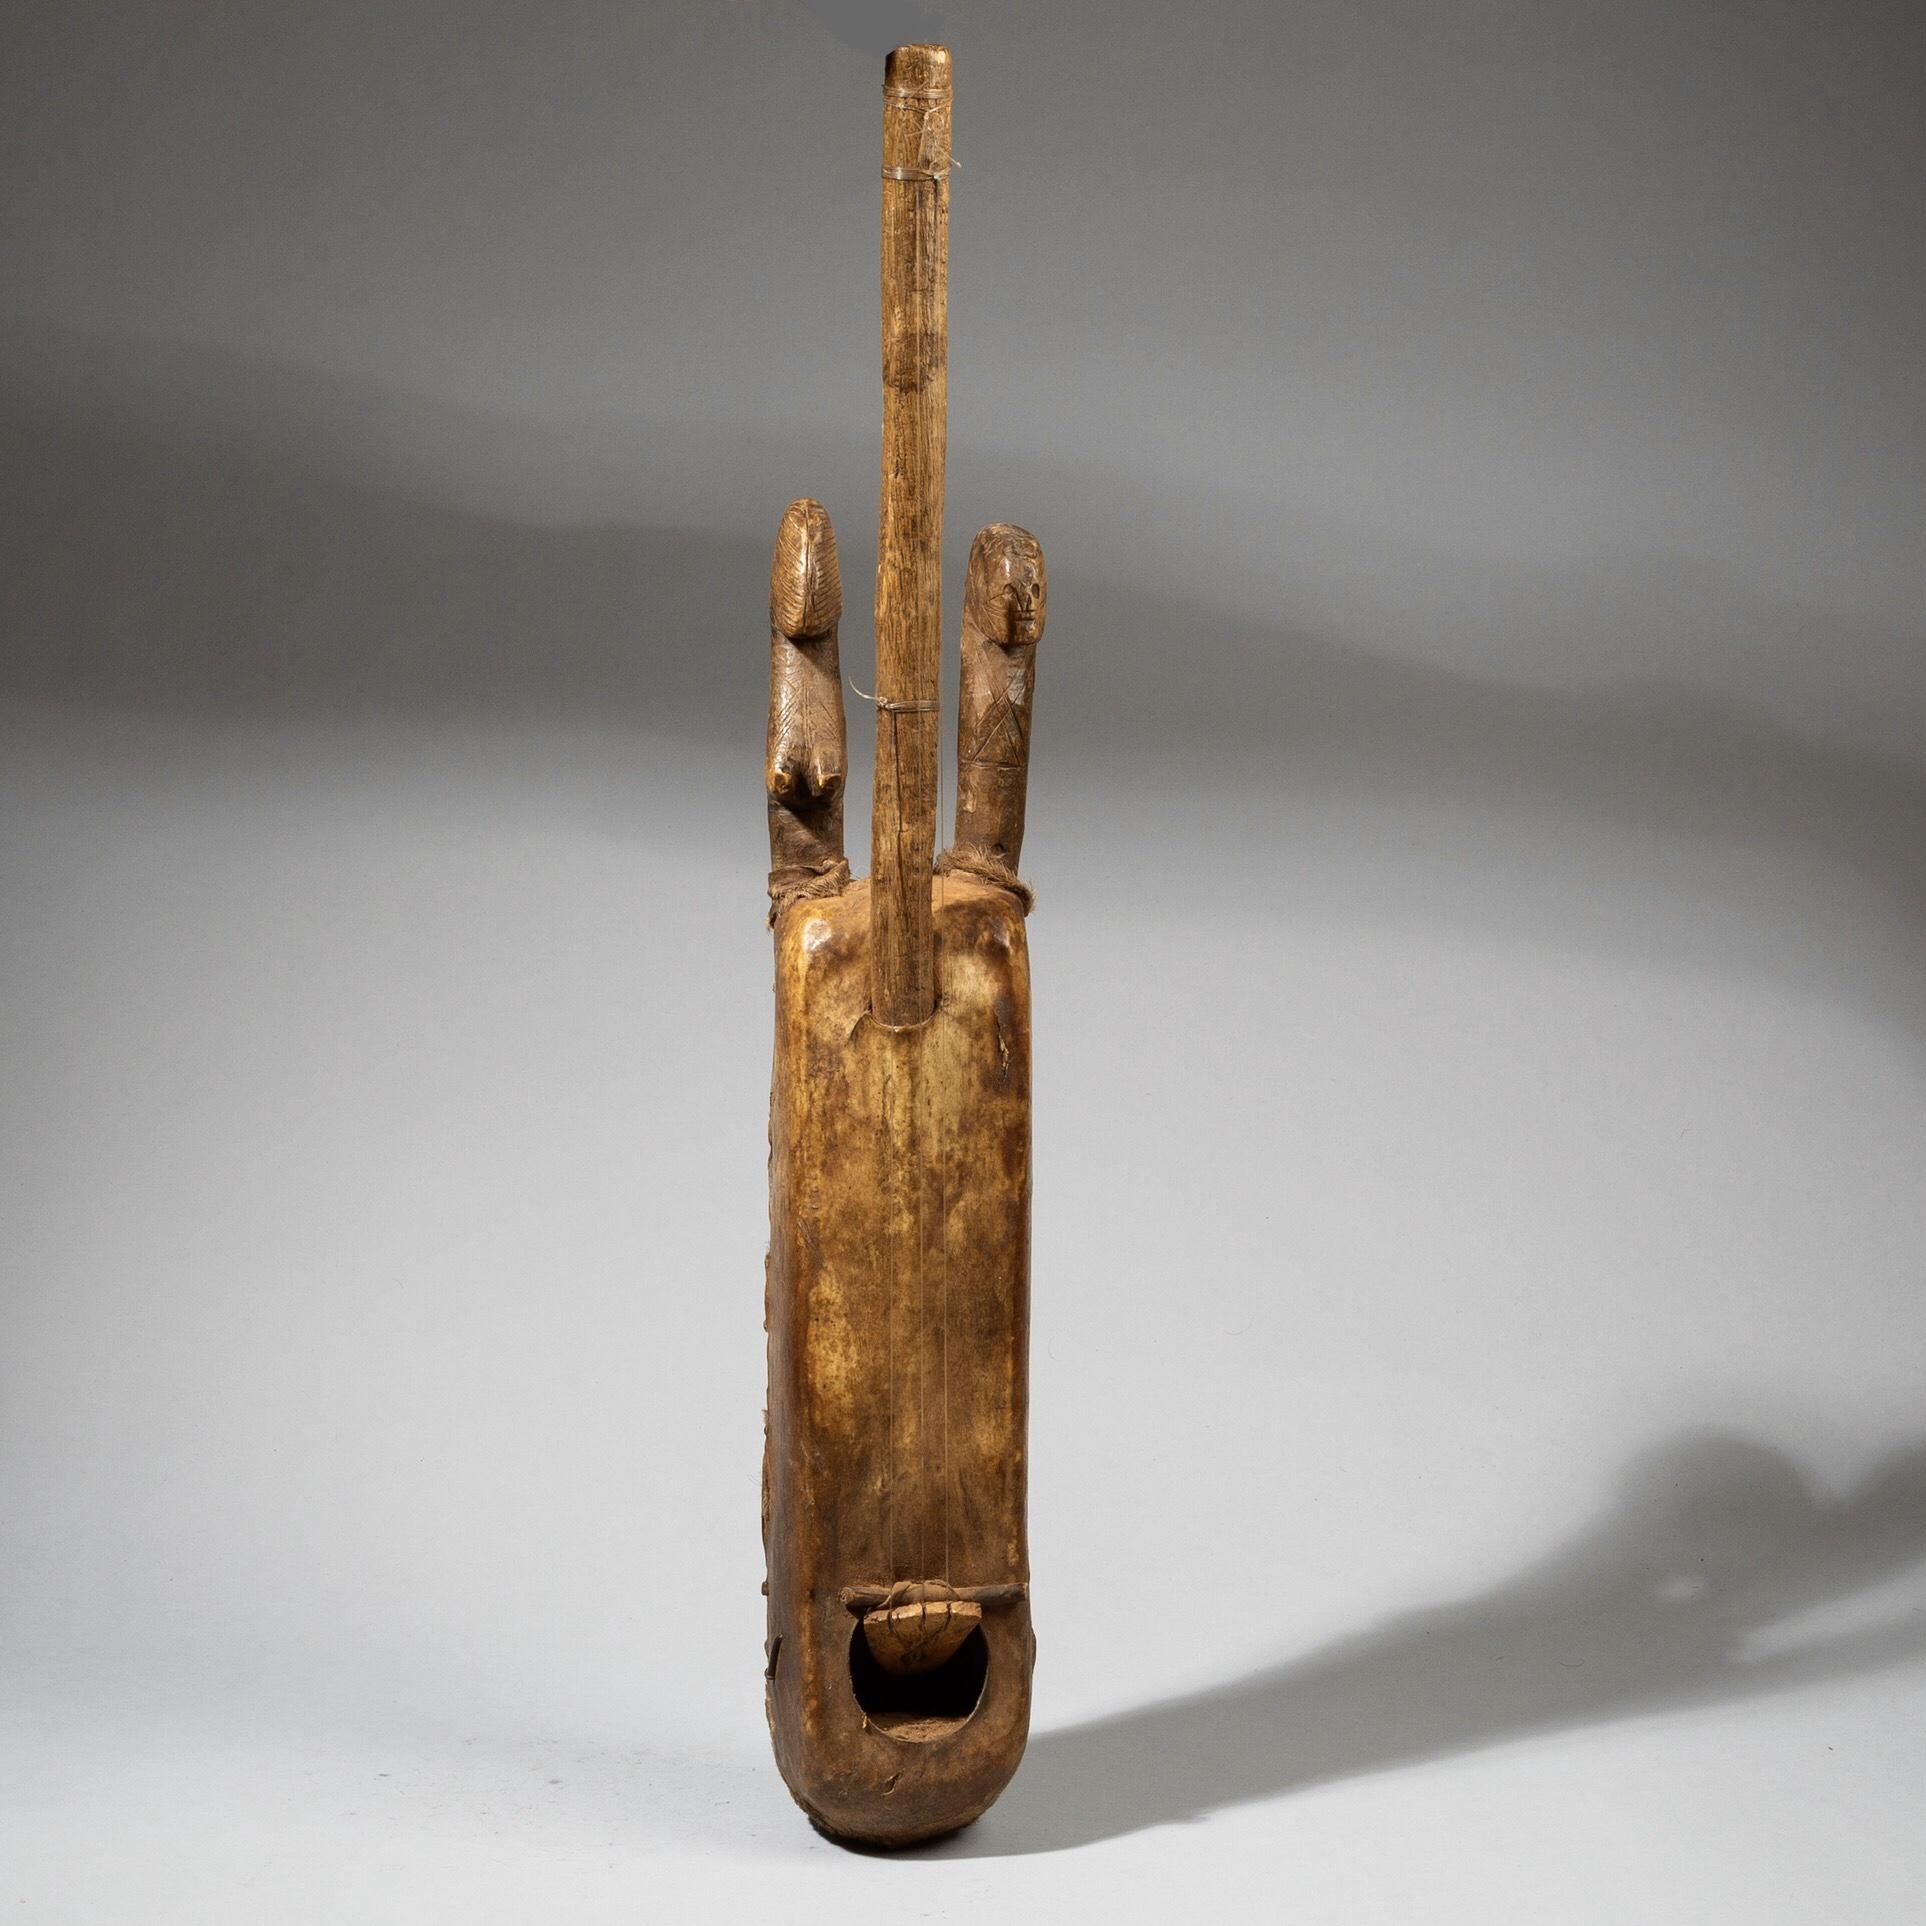 A FIGURATIVE MUSICAL INSTRUMENT, MOSSI TRIBE BURKINA FASO ( No 4415)